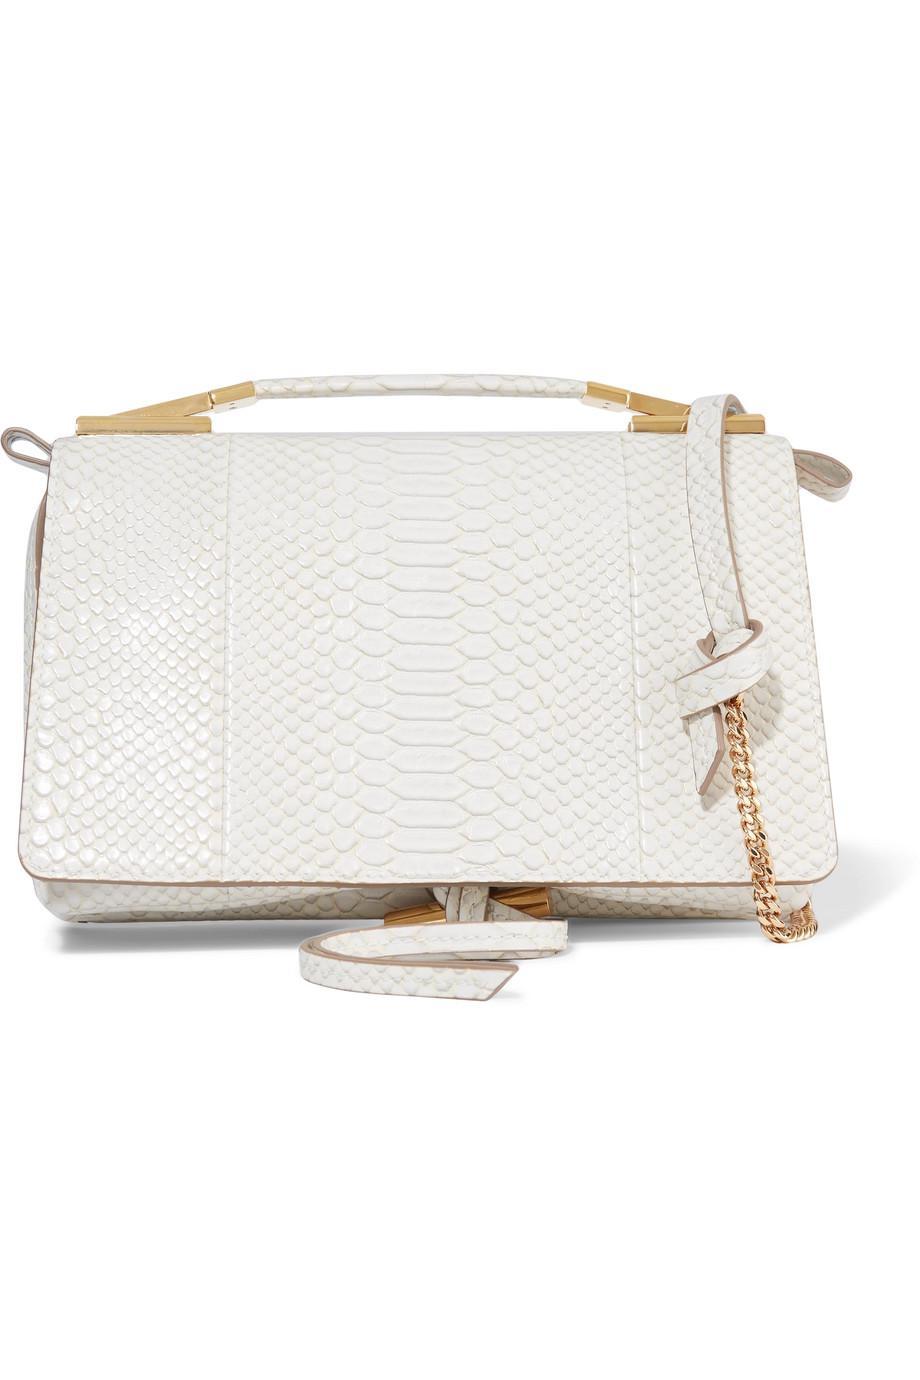 Flo Python-effect Faux Leather Shoulder Bag - Black Stella McCartney gwvwD